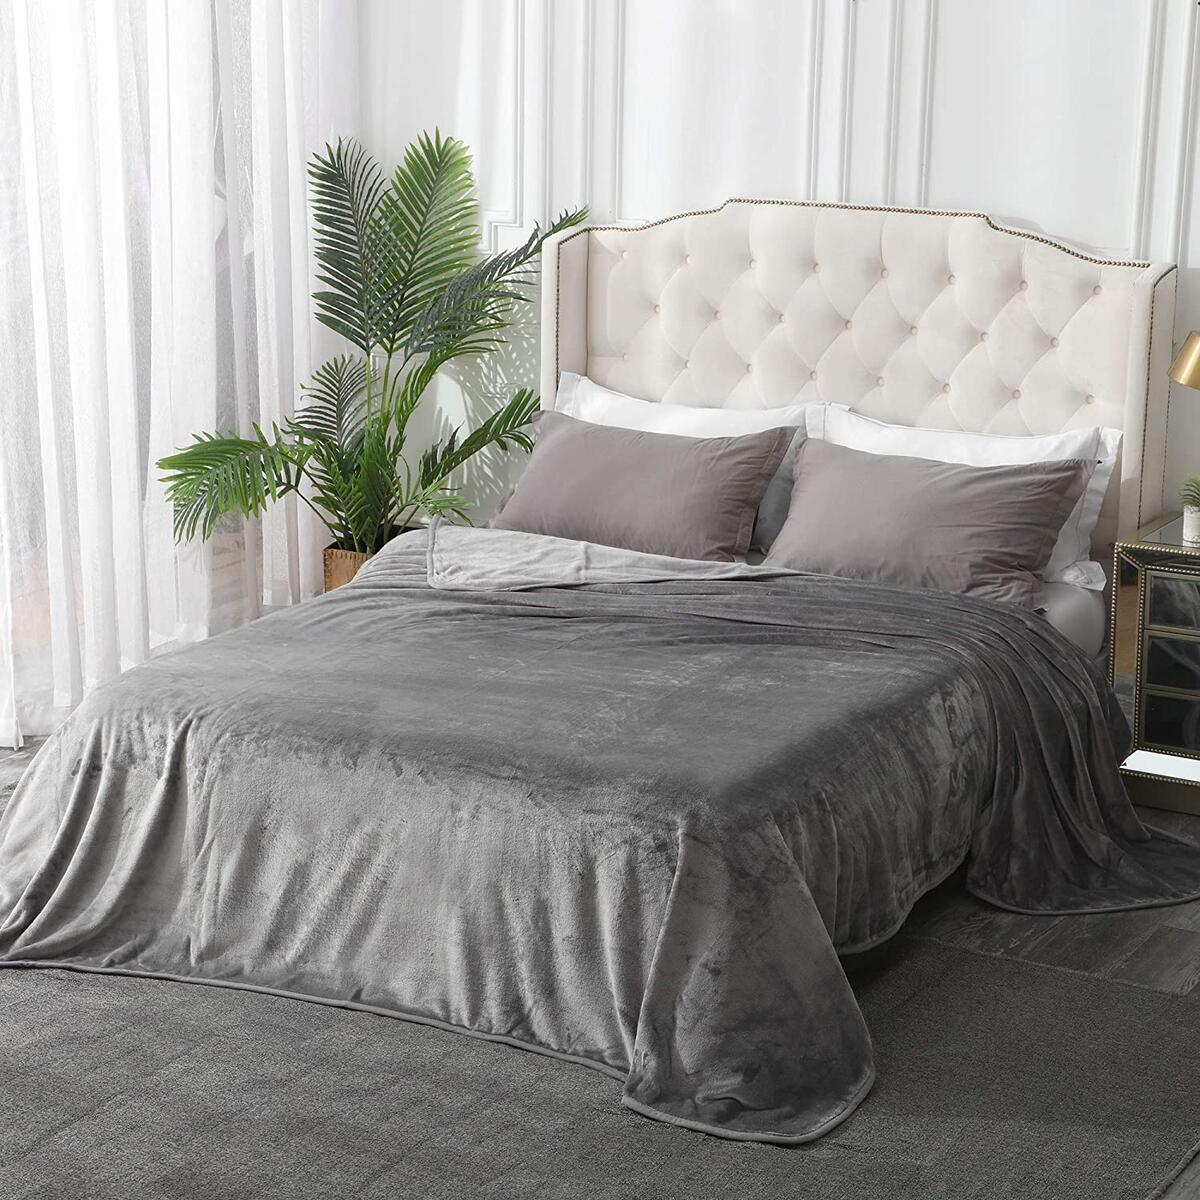 Leeden Ultra Soft Fleece Blanket King Size All Season Bed Blankets Throws for Couch Sofa Plush Warm Fuzzy Anti-Static Lightweight Flannel Microfiber (Light Grey,108